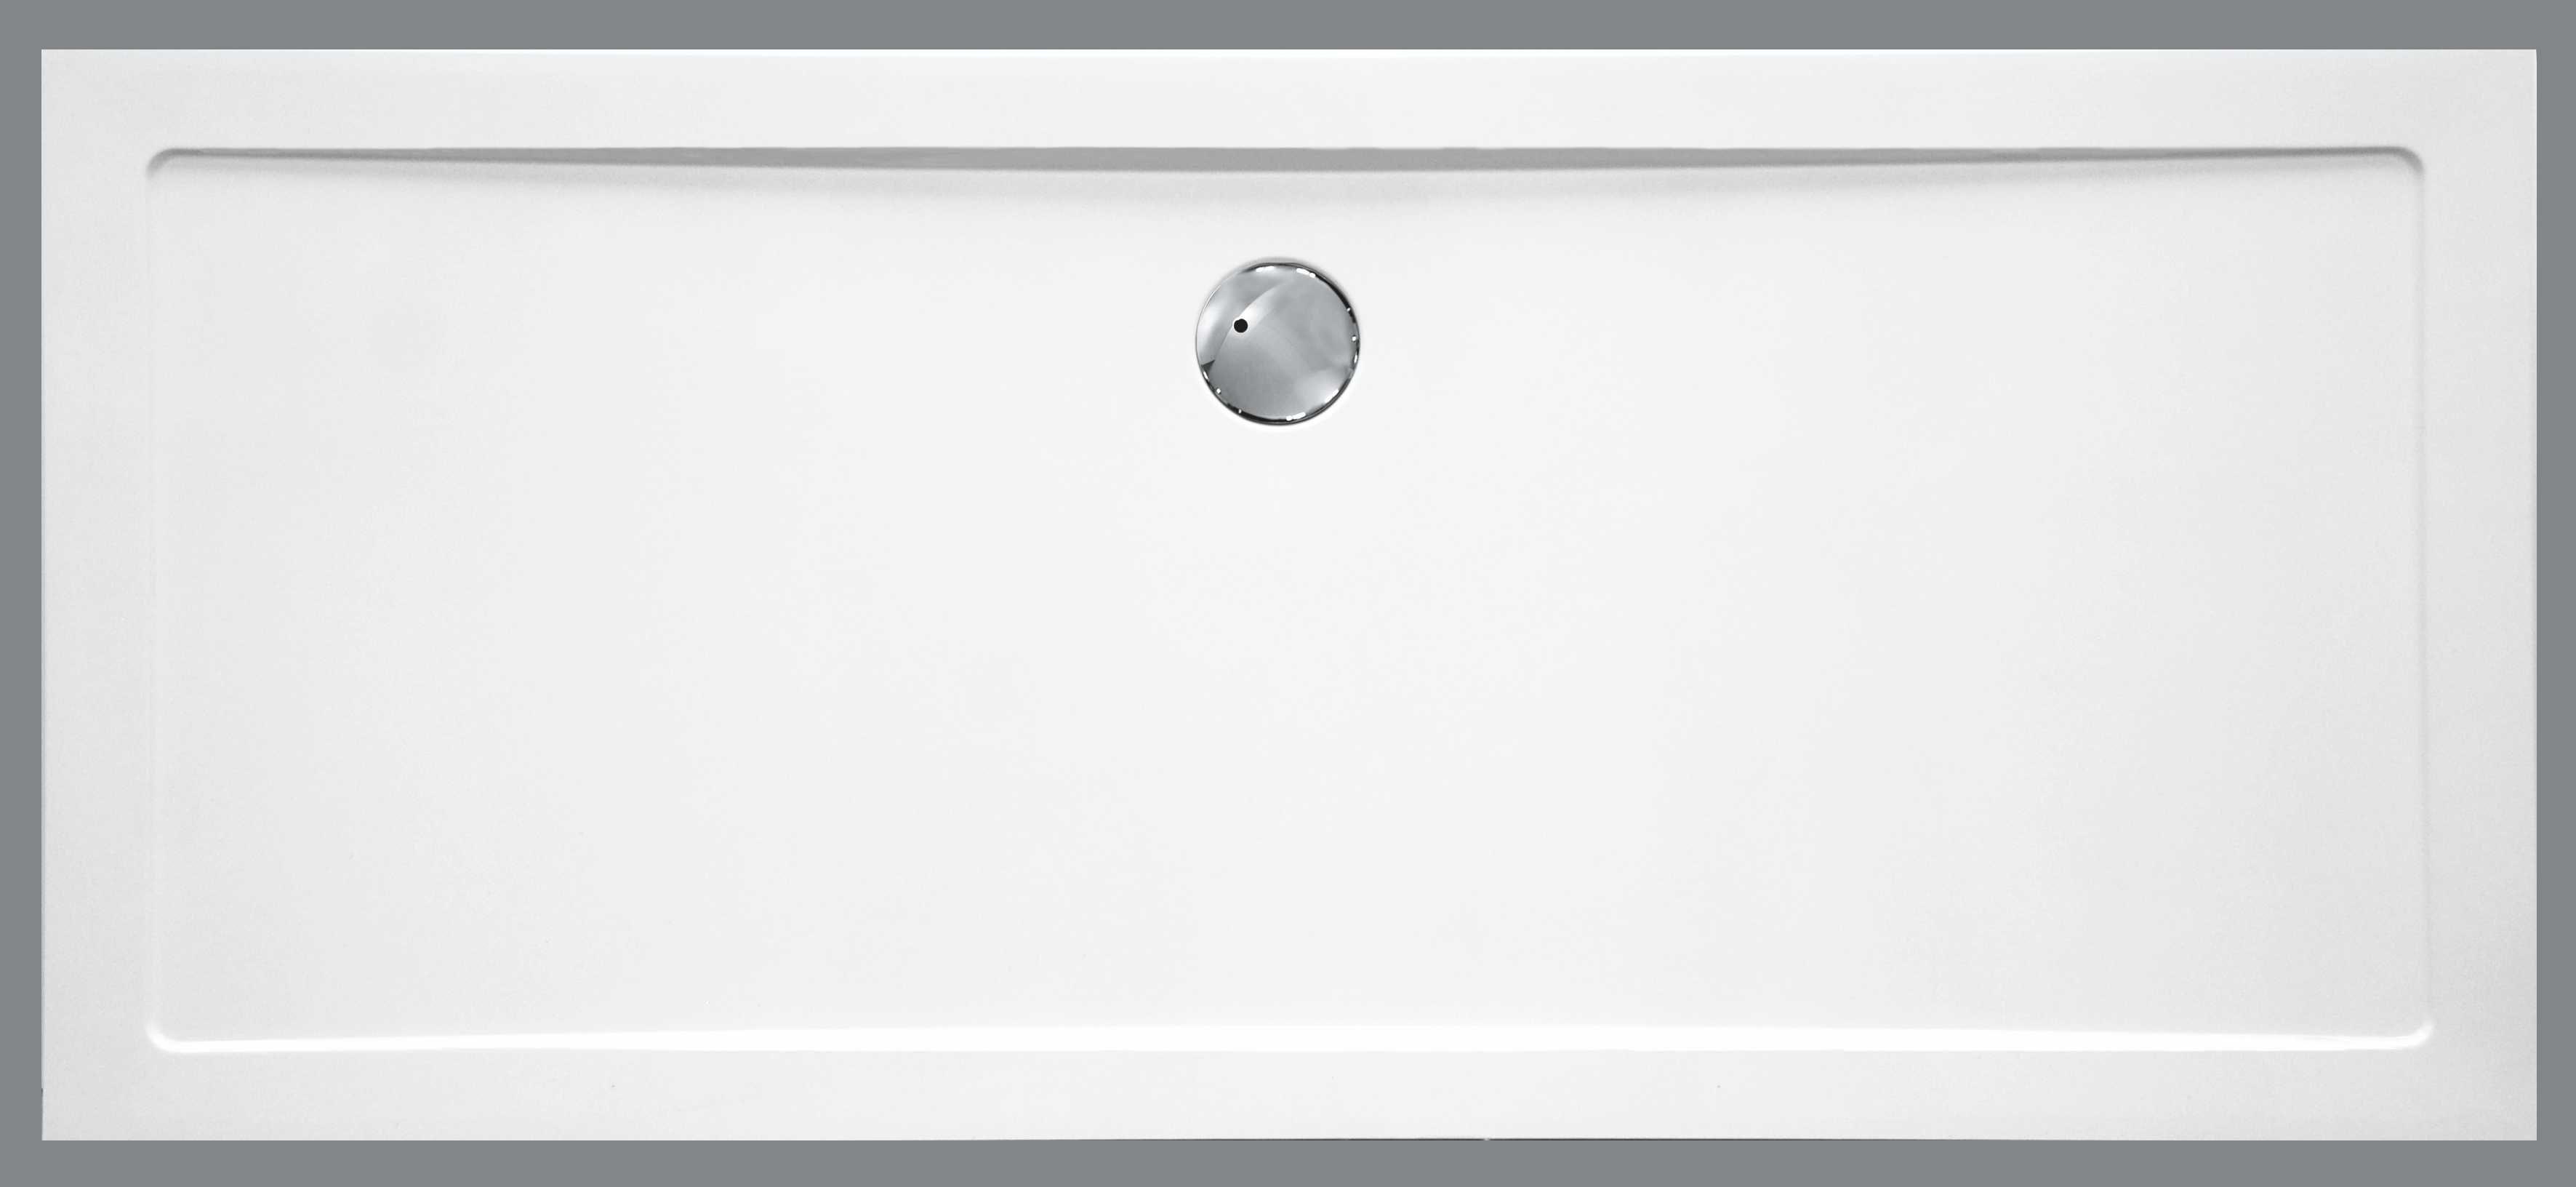 Badstuber Tris douchebak rechthoek SMC 120x90cm